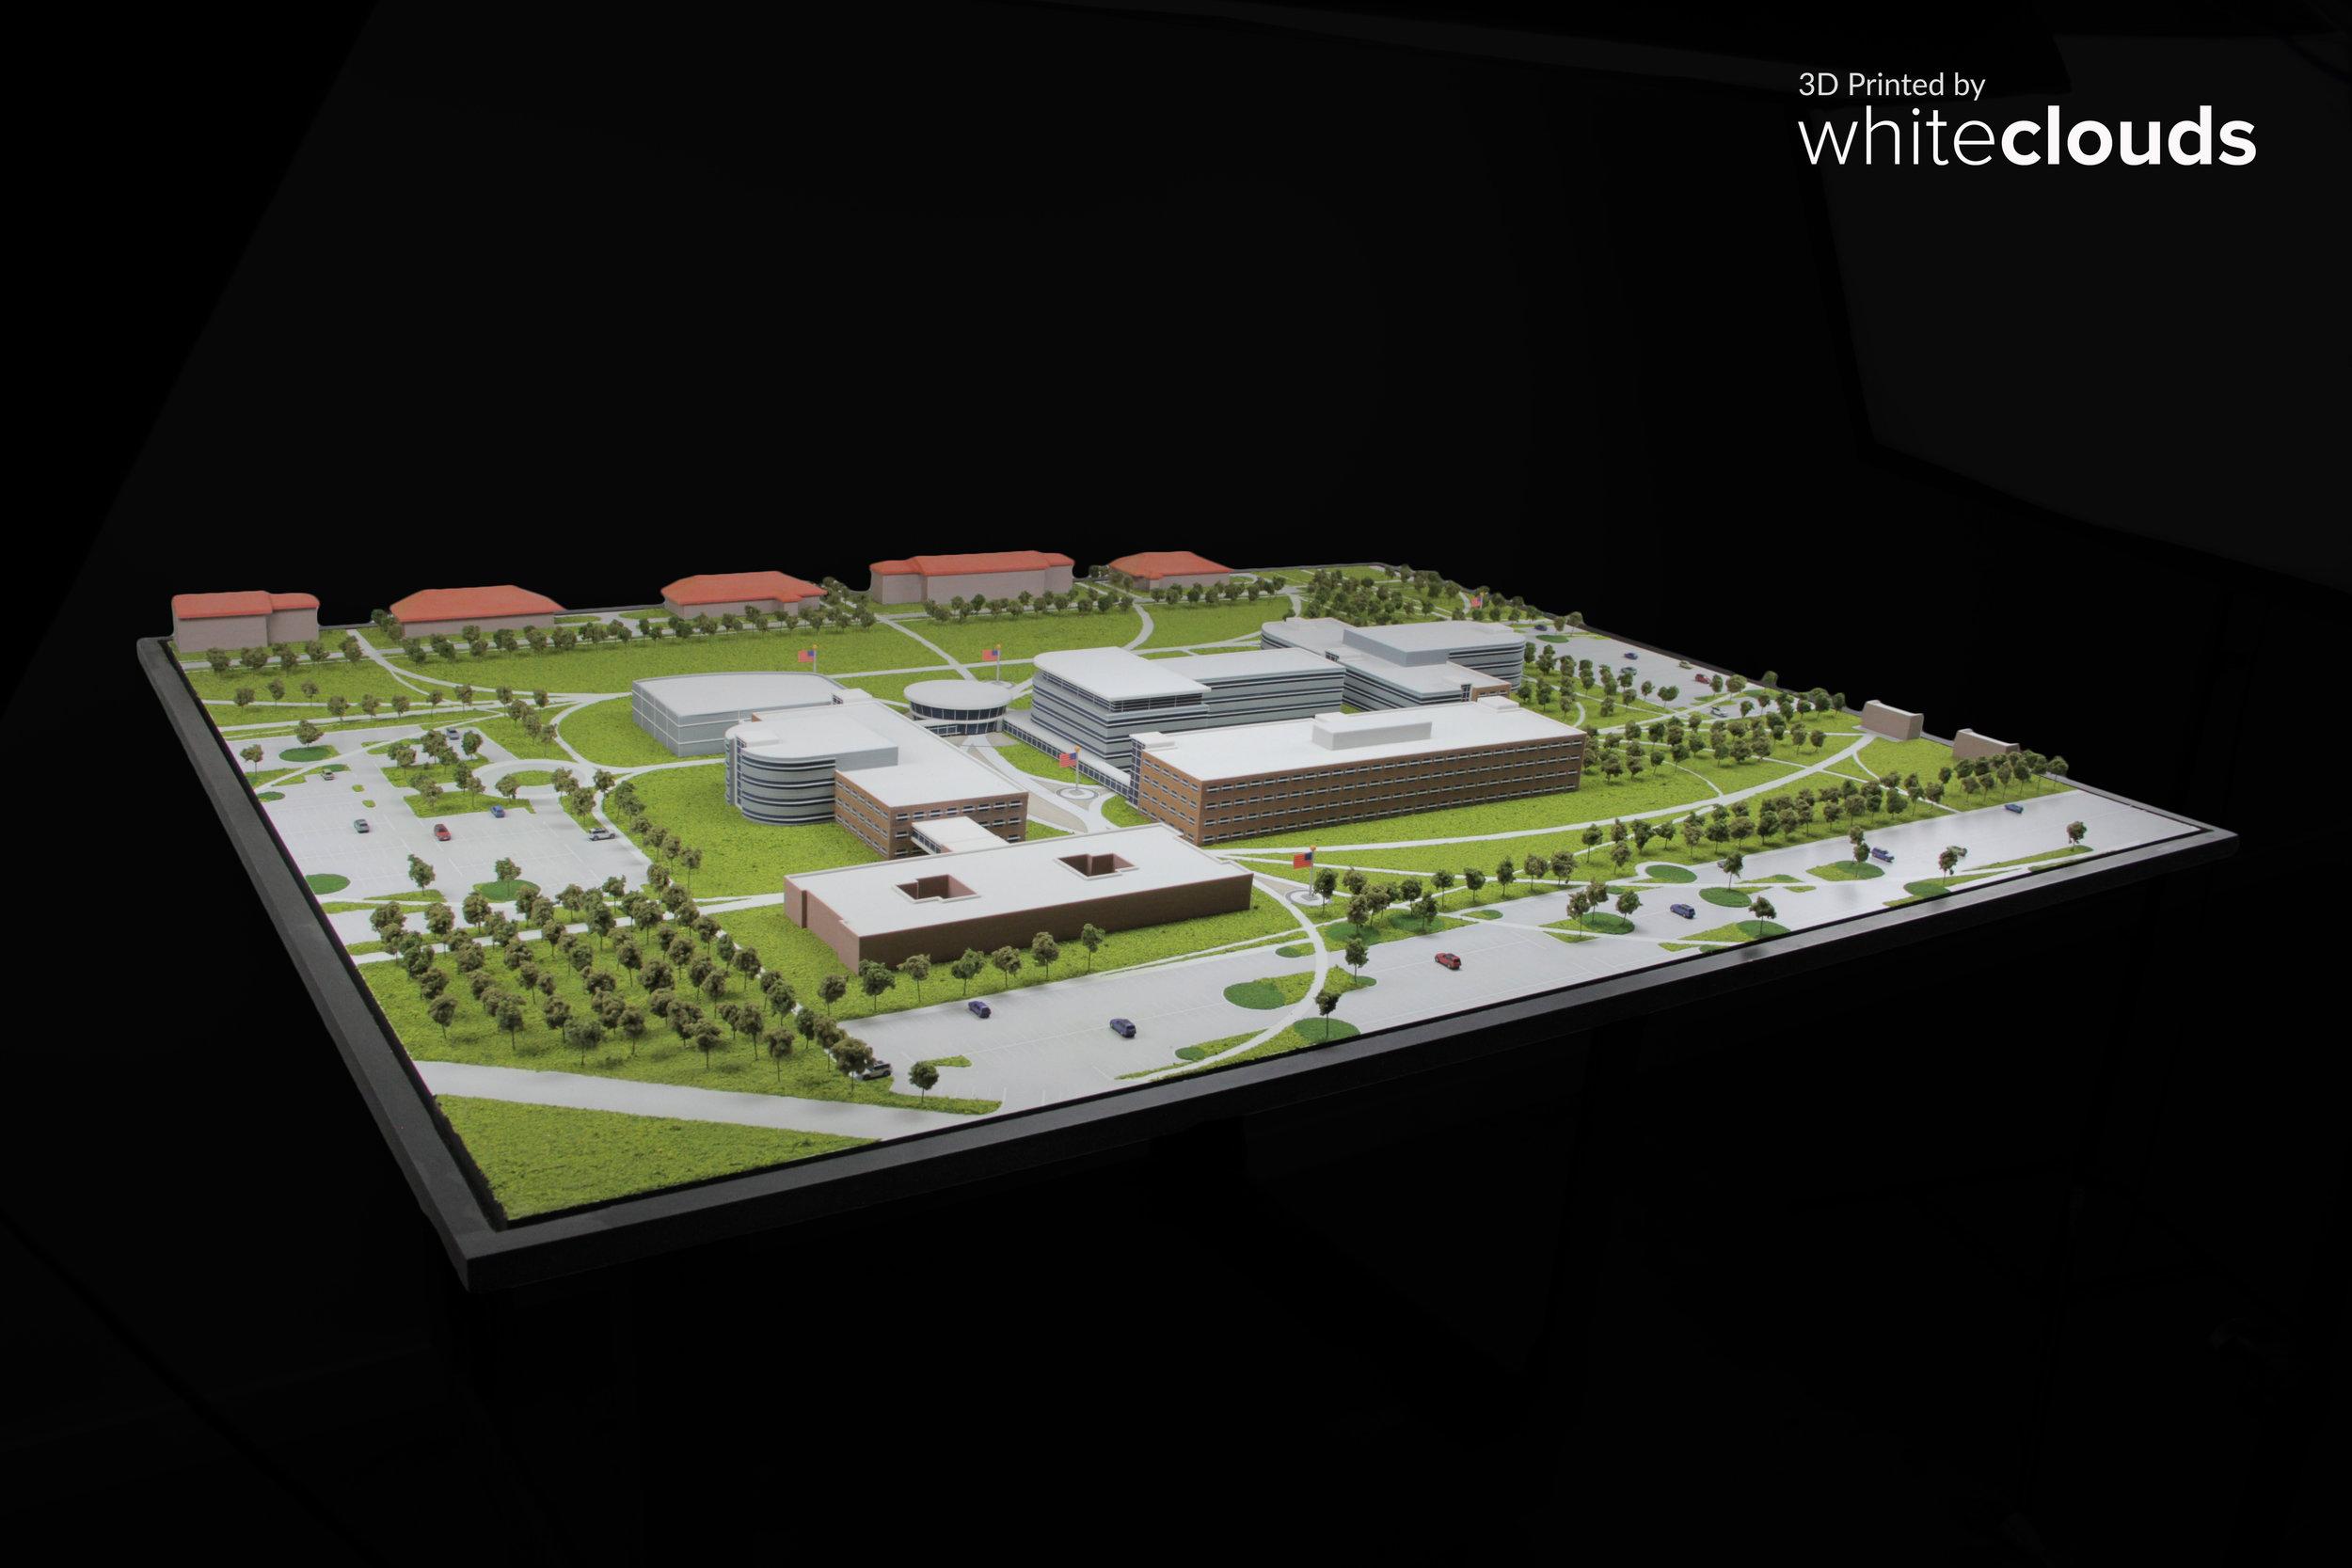 3D-Printed-WhiteClouds-Fort-Gordon-Architecture-Fort-Gordon-Website-2.JPG